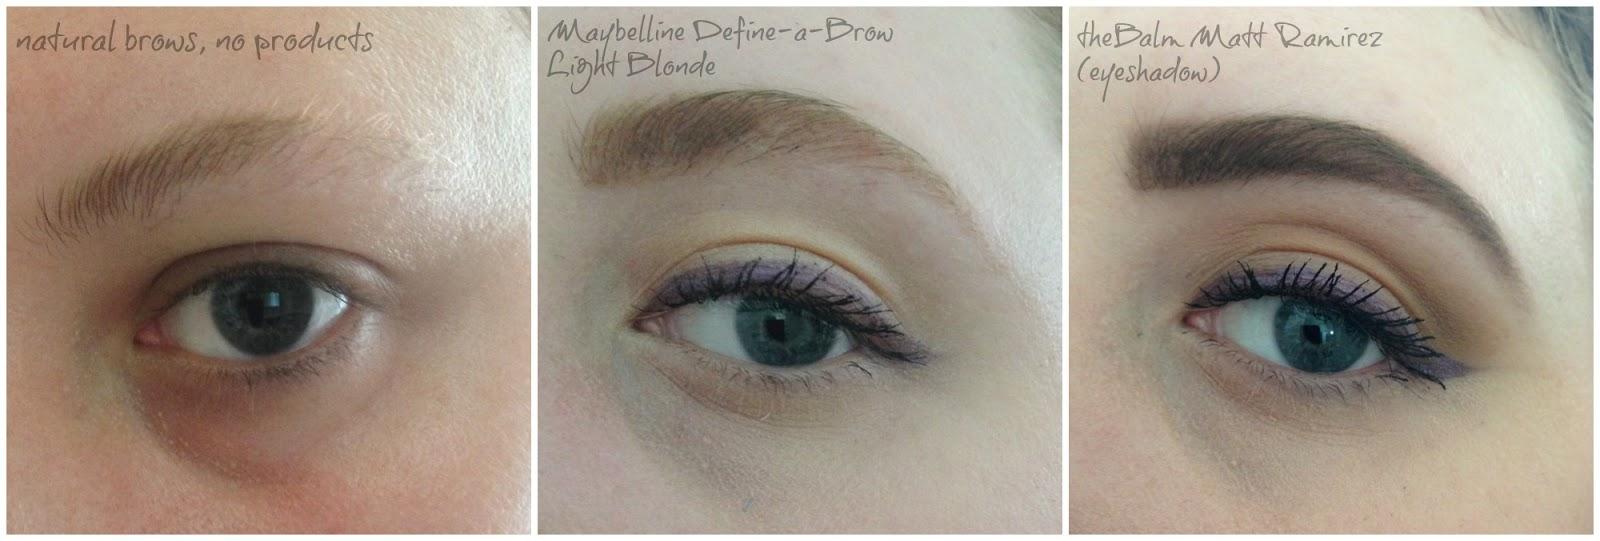 Eyebrow Pencil For Brown Hair